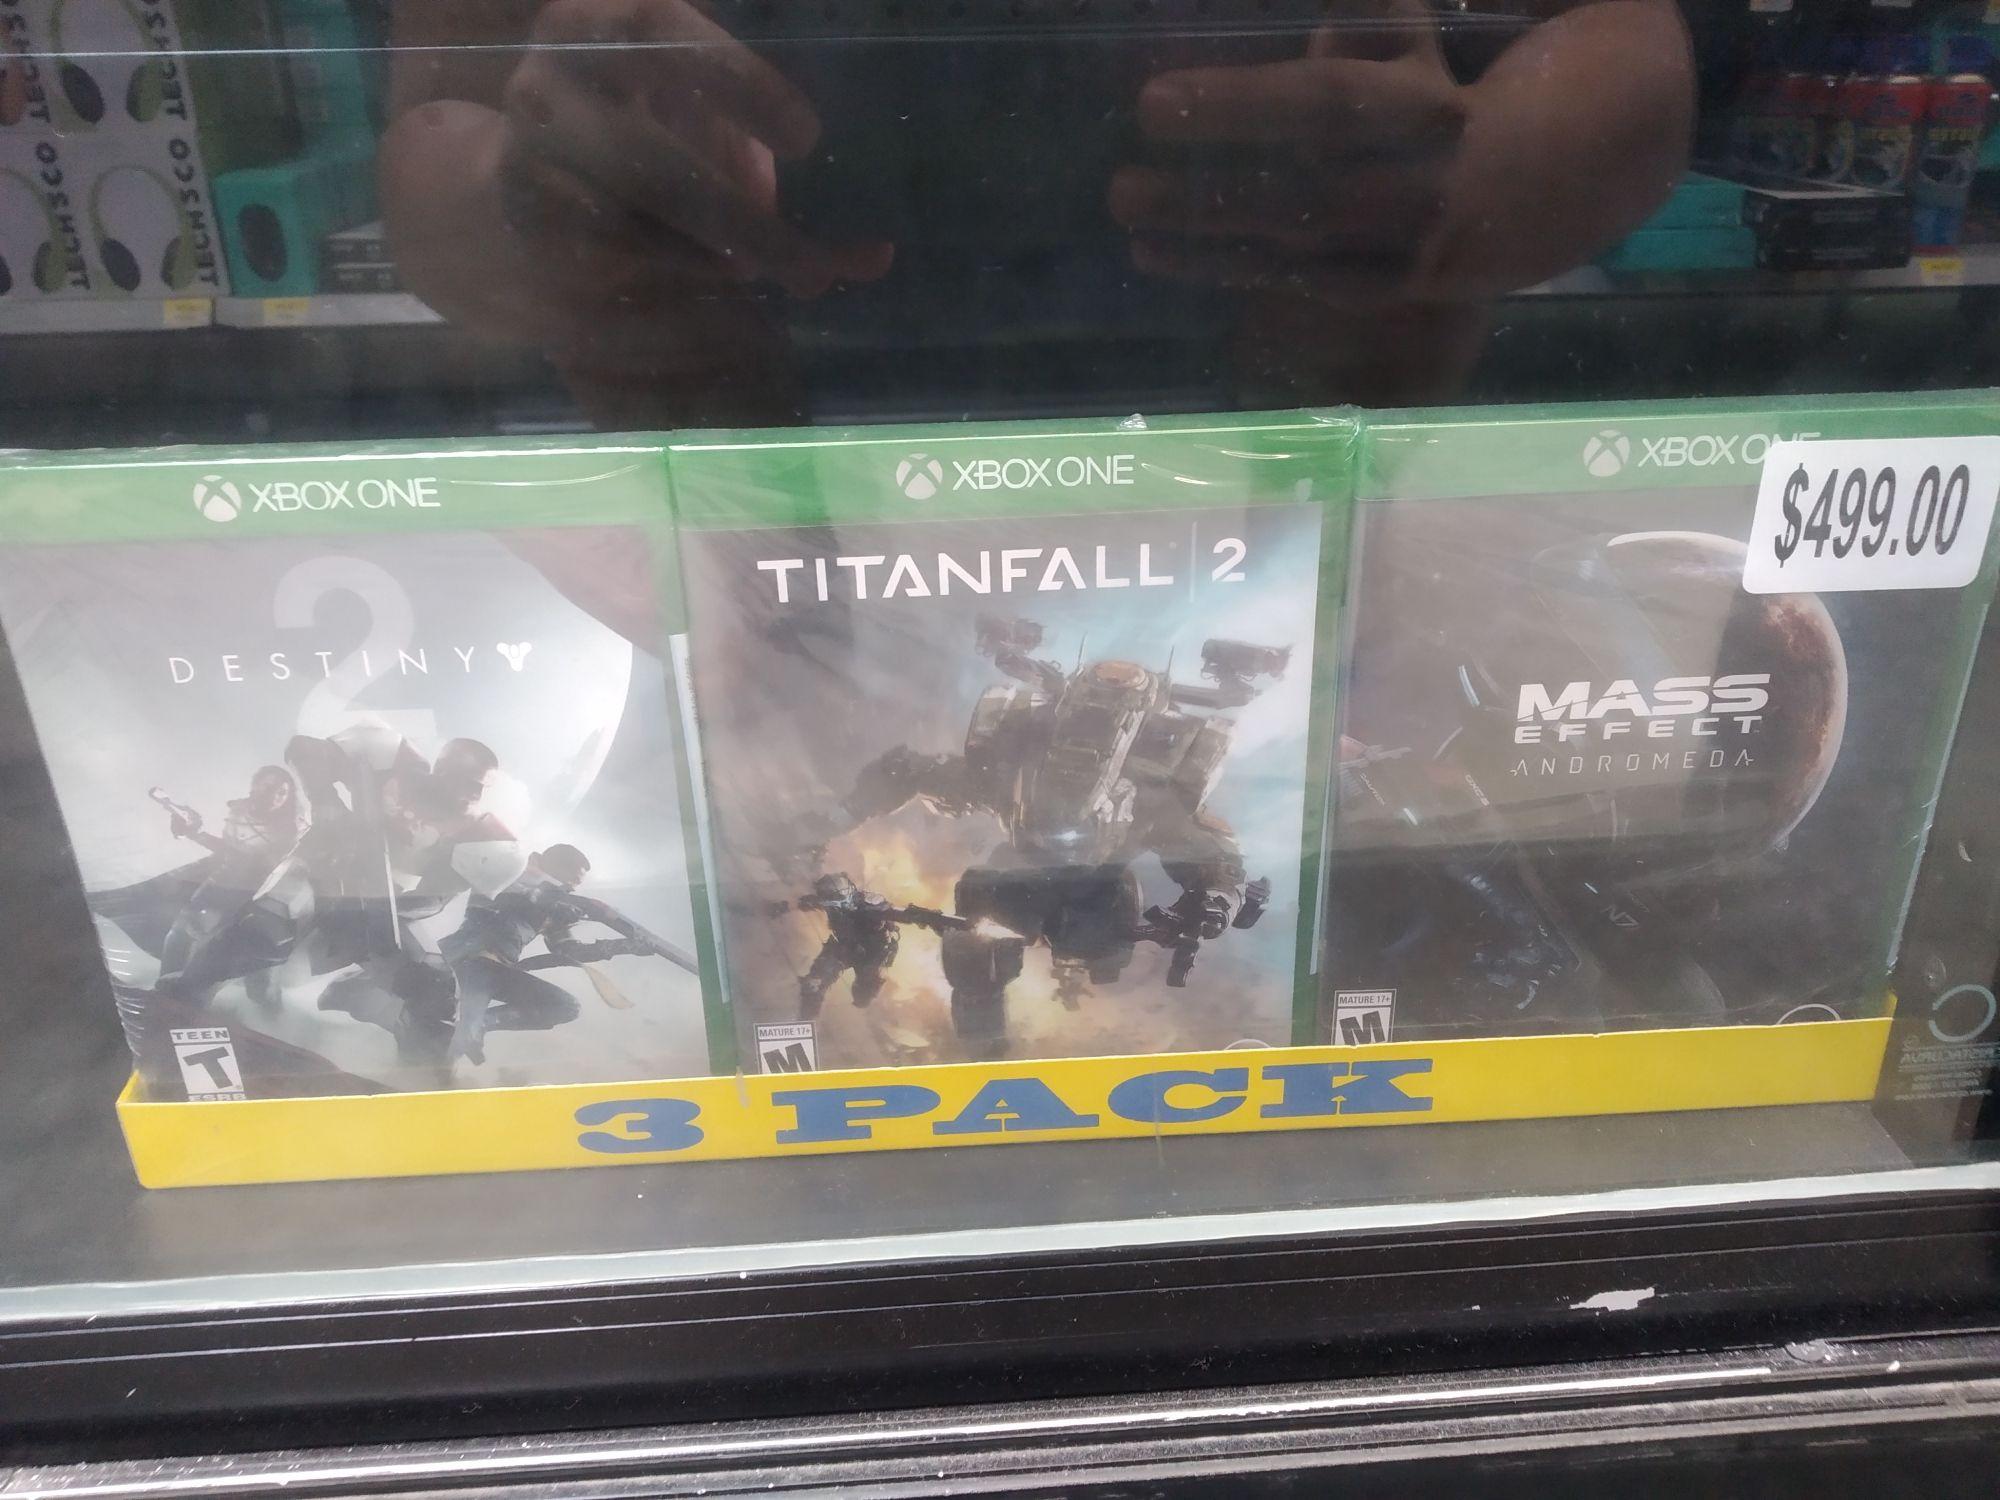 Bodega Aurrera: Paquete de tres juegos (Destiny, Titanfall 2 y Mass Effect Andromeda)